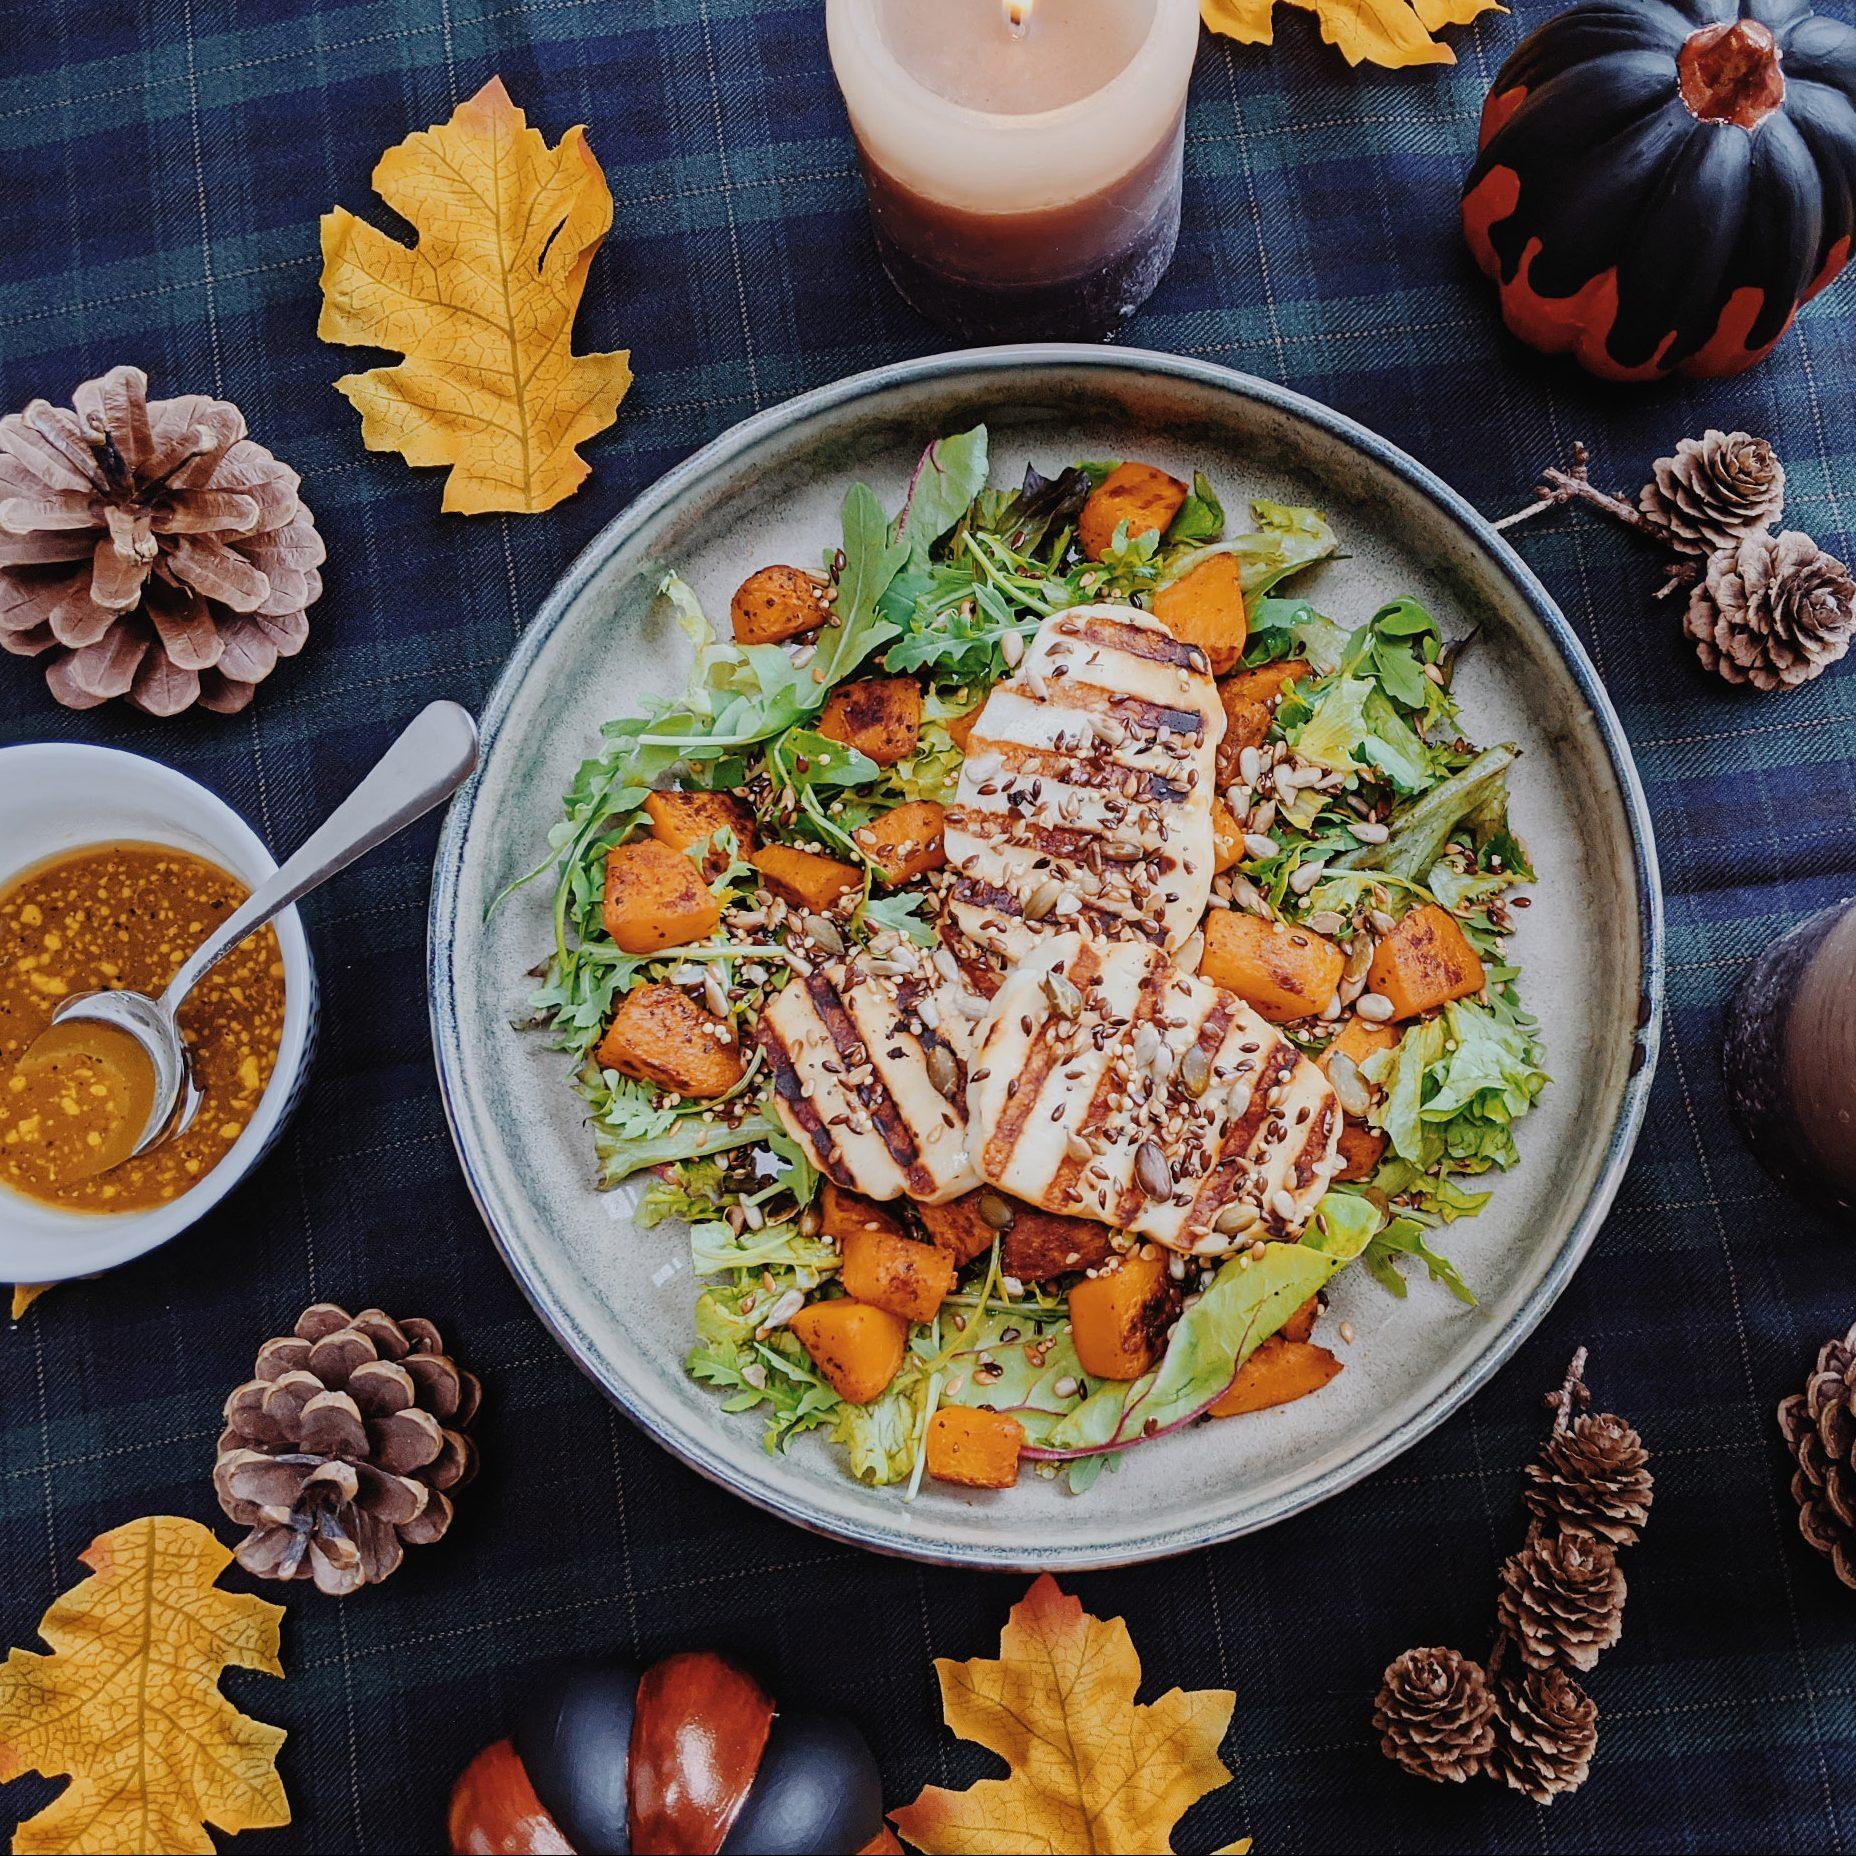 Salade met pompoen & Halloumi